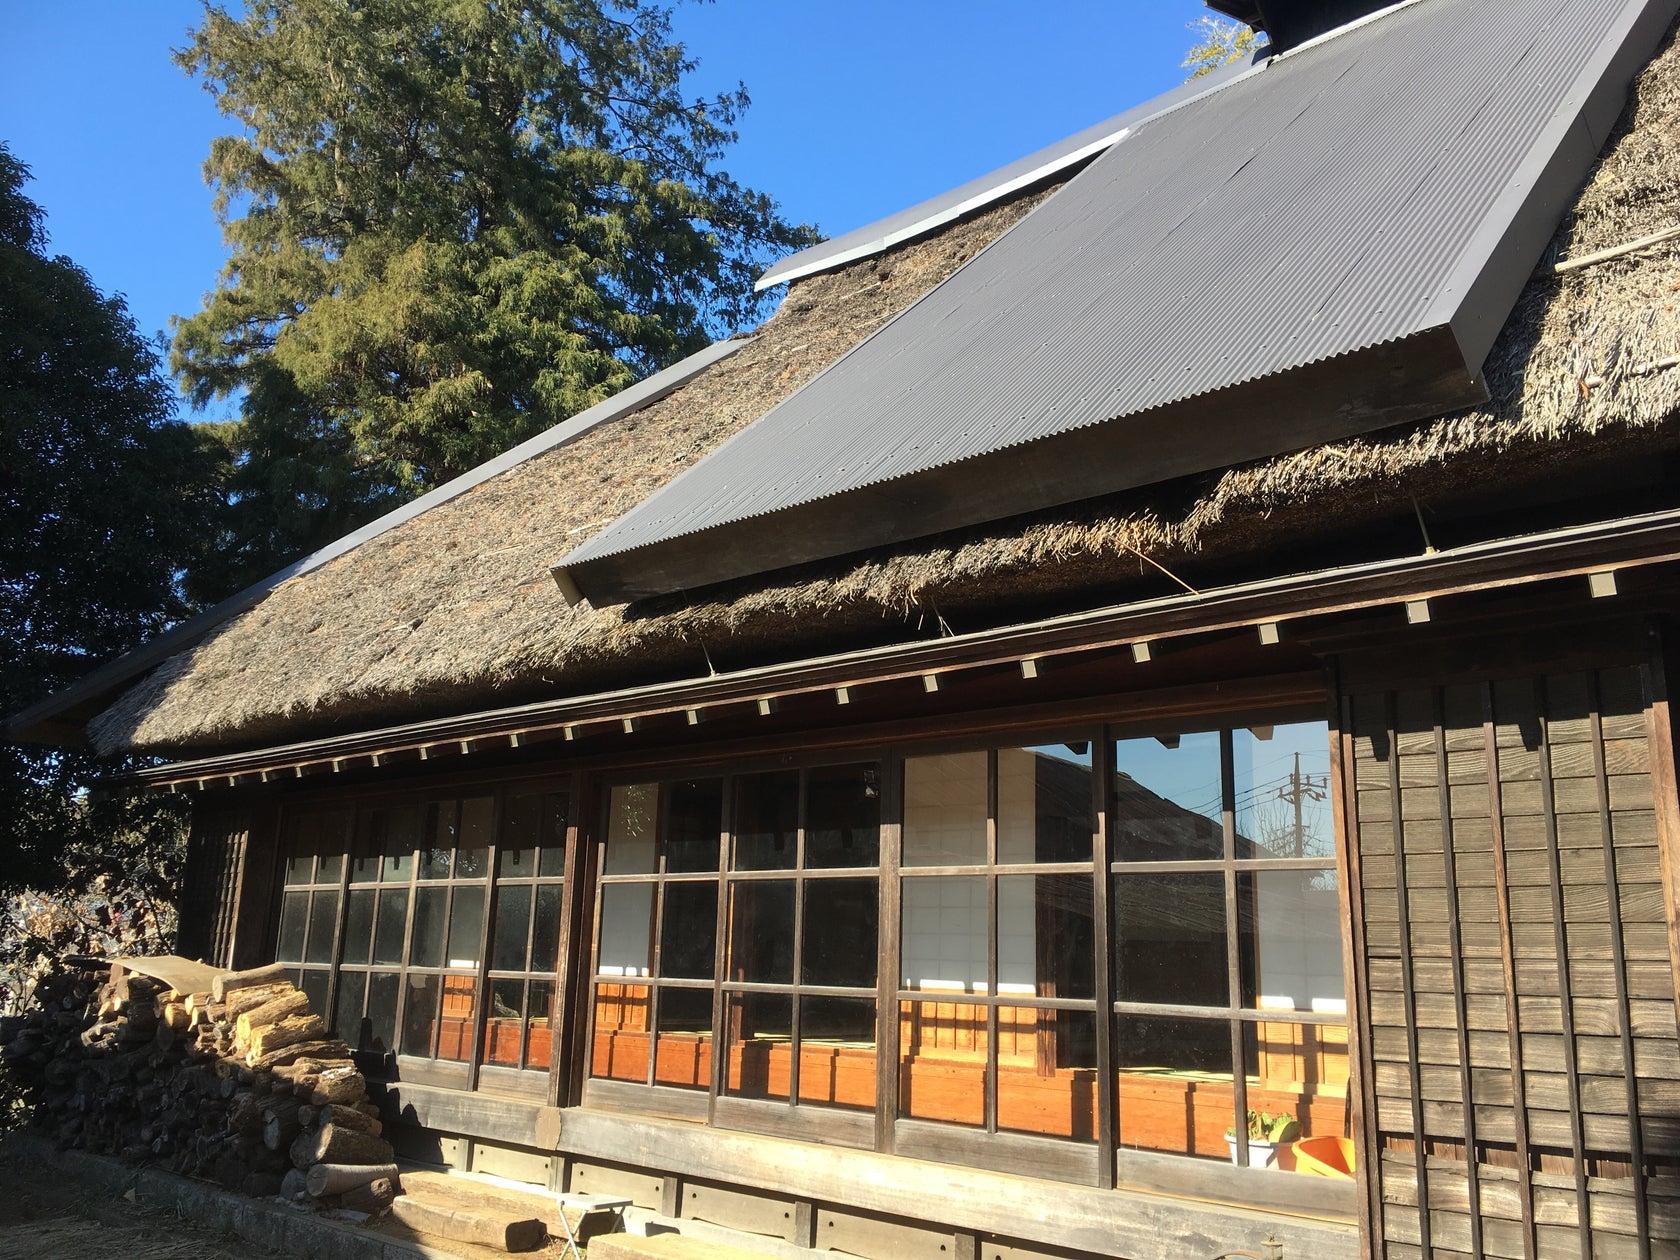 Osmo Pocketが使える!【東京 町田】築153年の茅葺き古民家で、春のお花、新緑と戯れよう!写真撮影スポット多数。 の写真